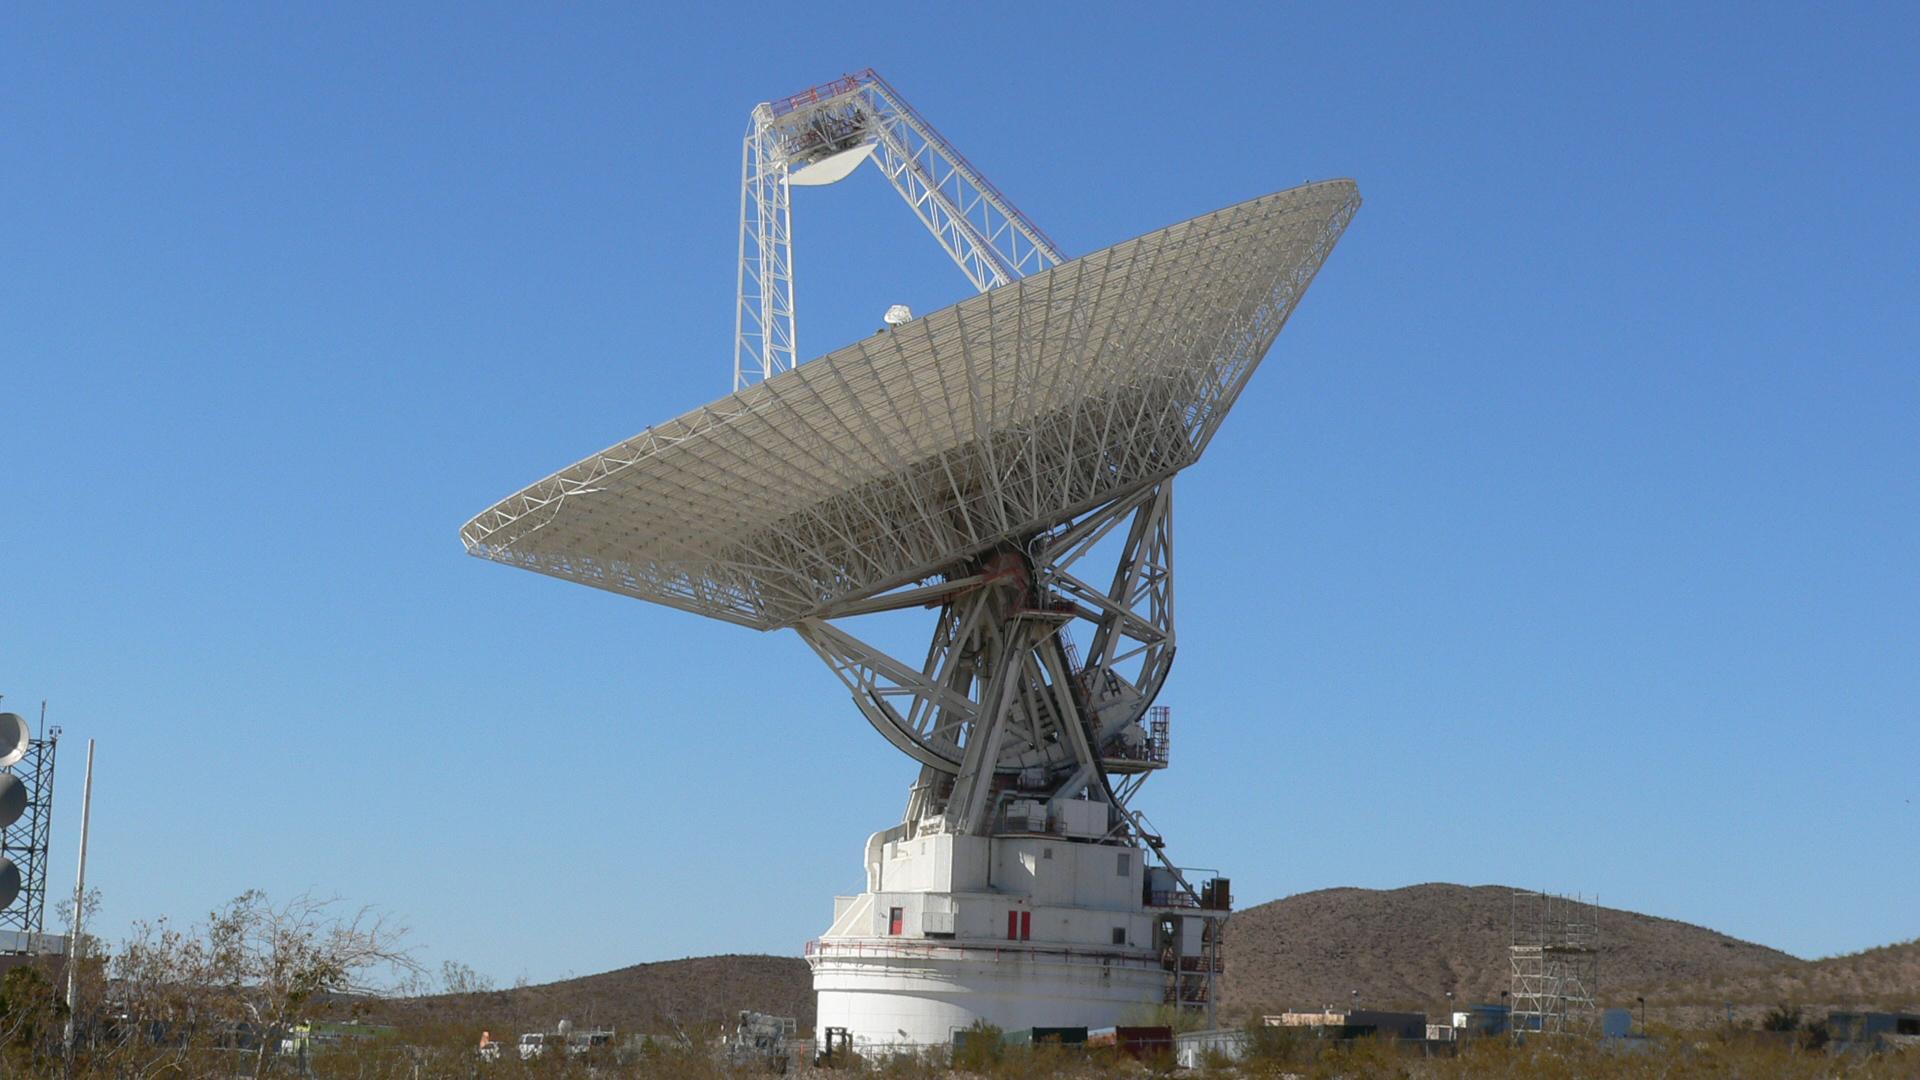 Nasa Deep Space Network Antenna Starts Major Surgery